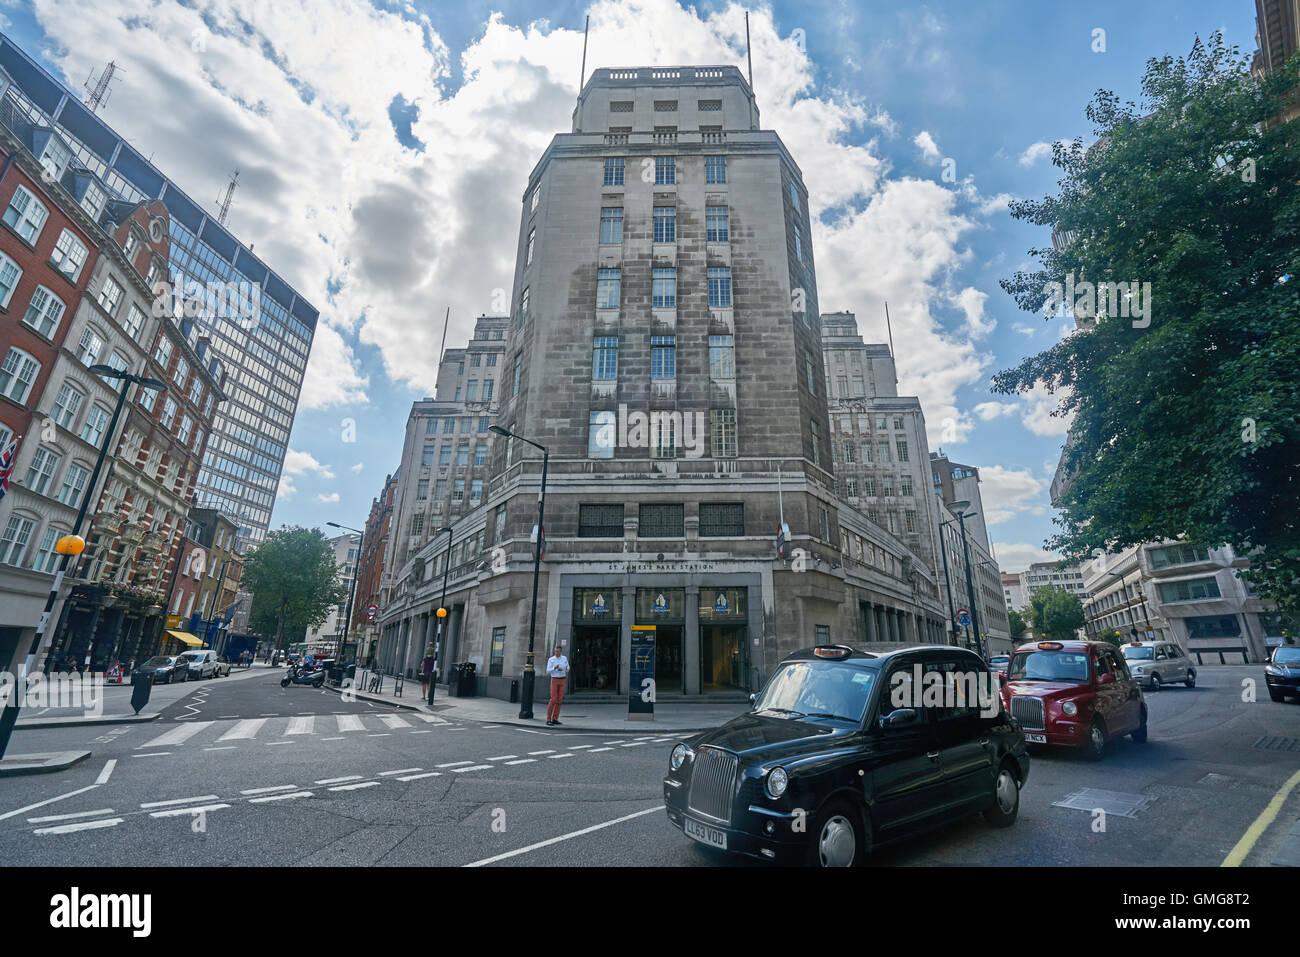 St James Underground. TFL building - Stock Image